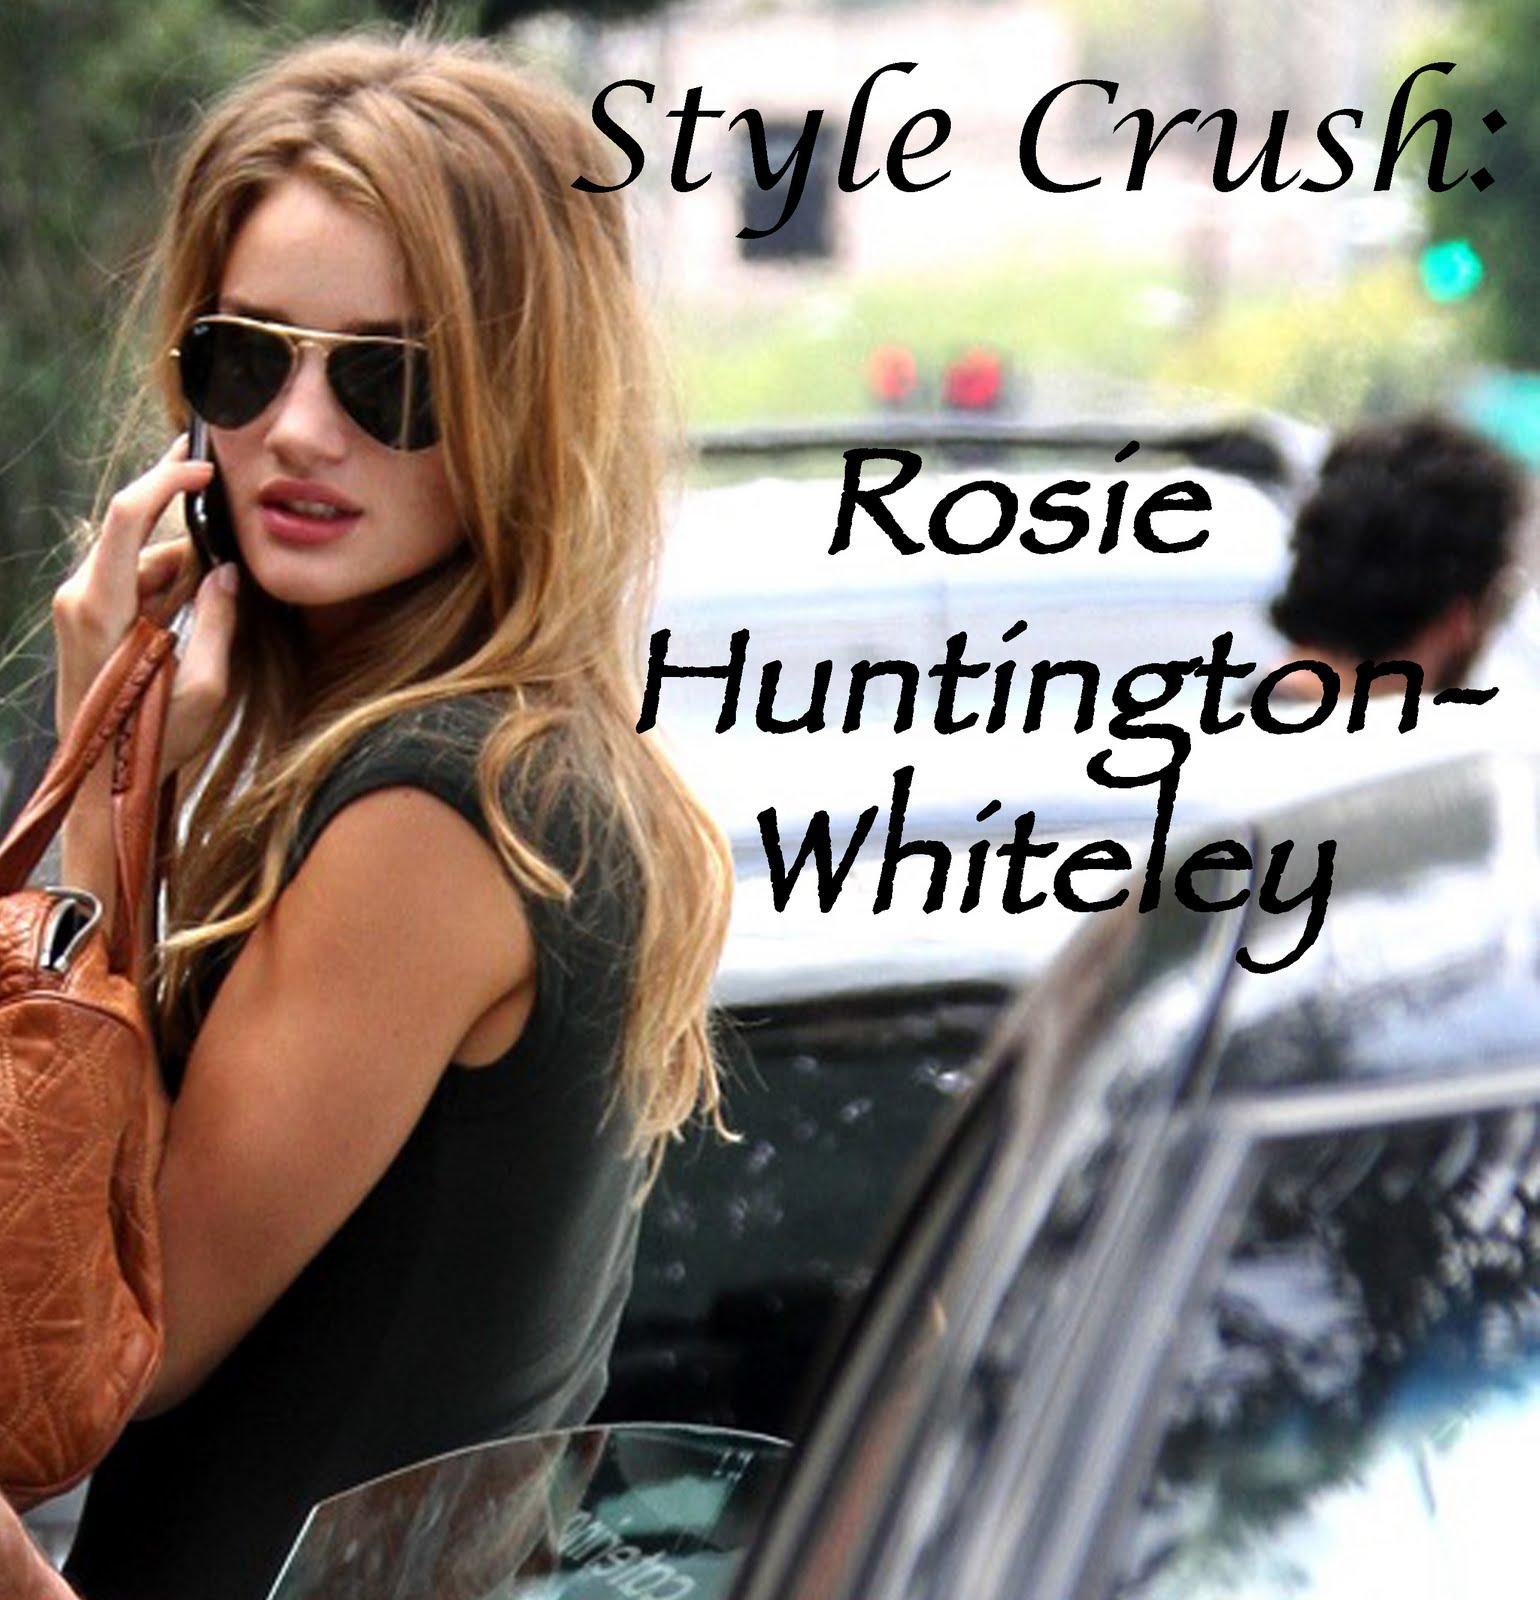 http://4.bp.blogspot.com/-oahPDK0i5TM/TemHht94dNI/AAAAAAAAEBQ/KO5ZcX5KR4g/s1600/Rosie%2BHuntington-Whiteley.jpg